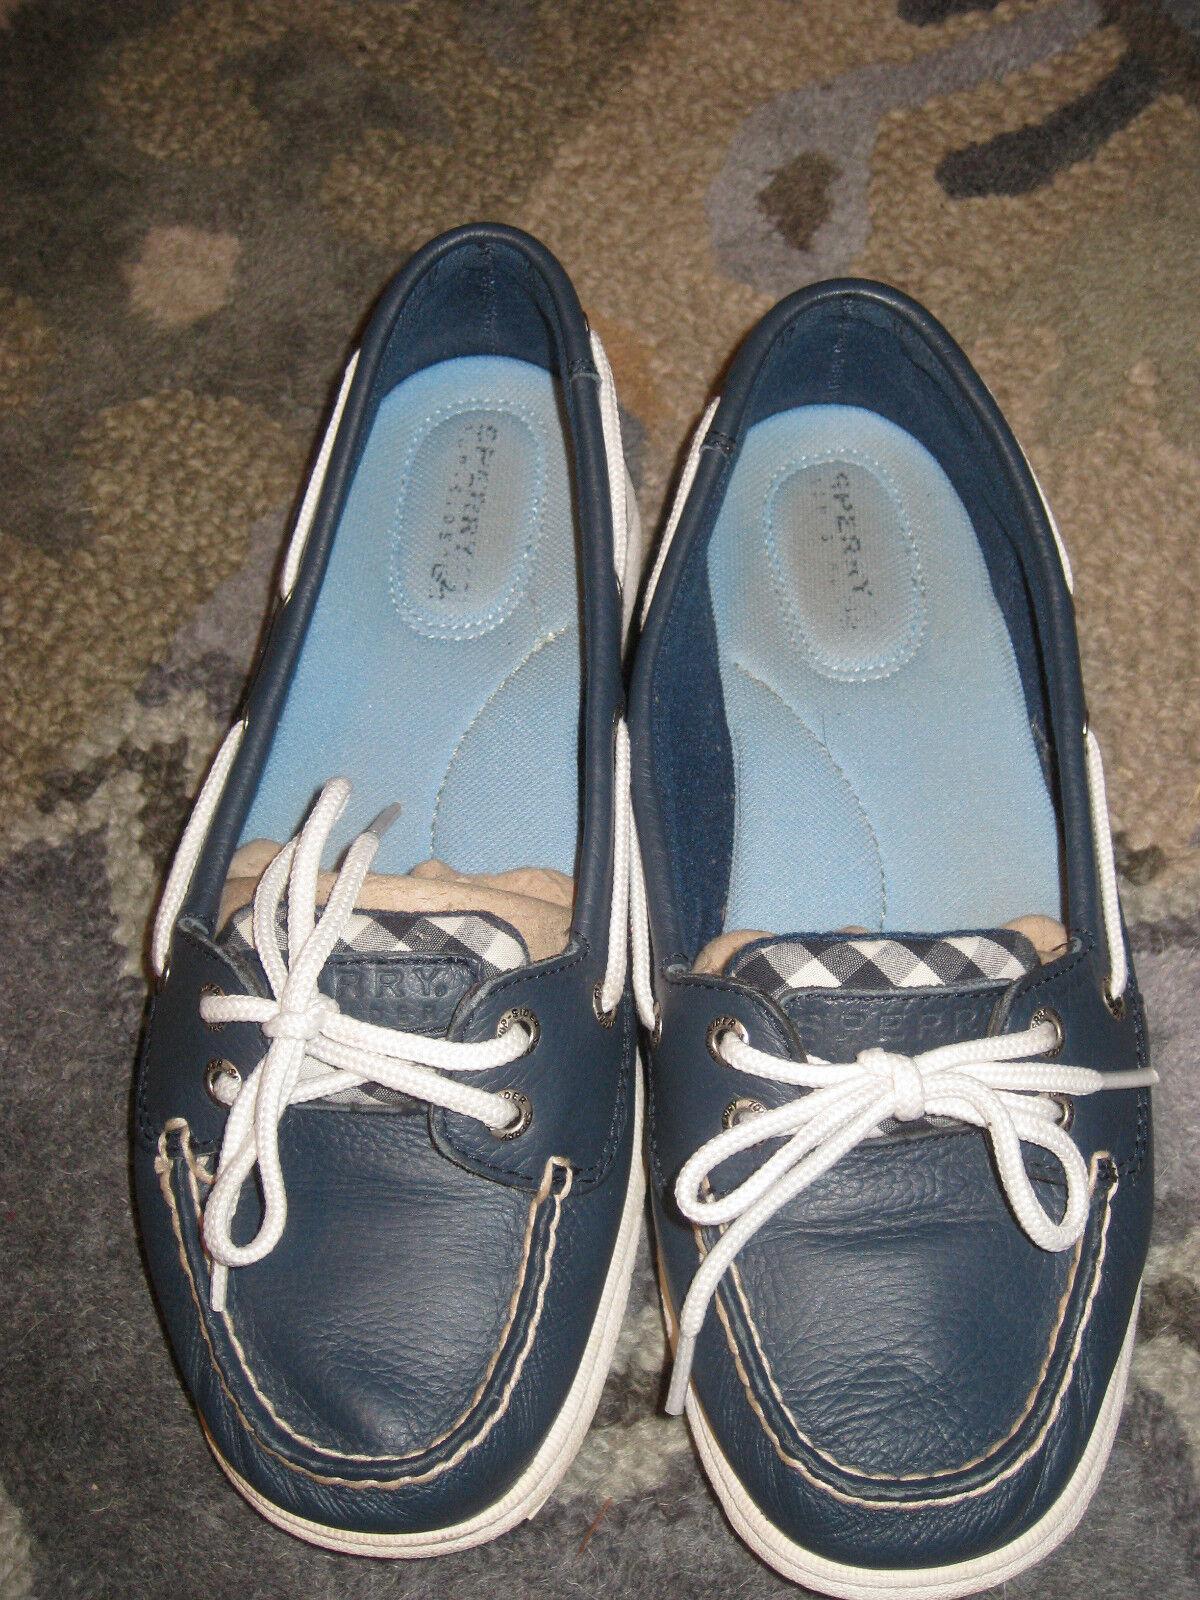 Damenschuhe SPERRY TOP SIDER NAVY Blau PLAID LOAFERS BOAT Schuhe SIZE 7M LACED Blau